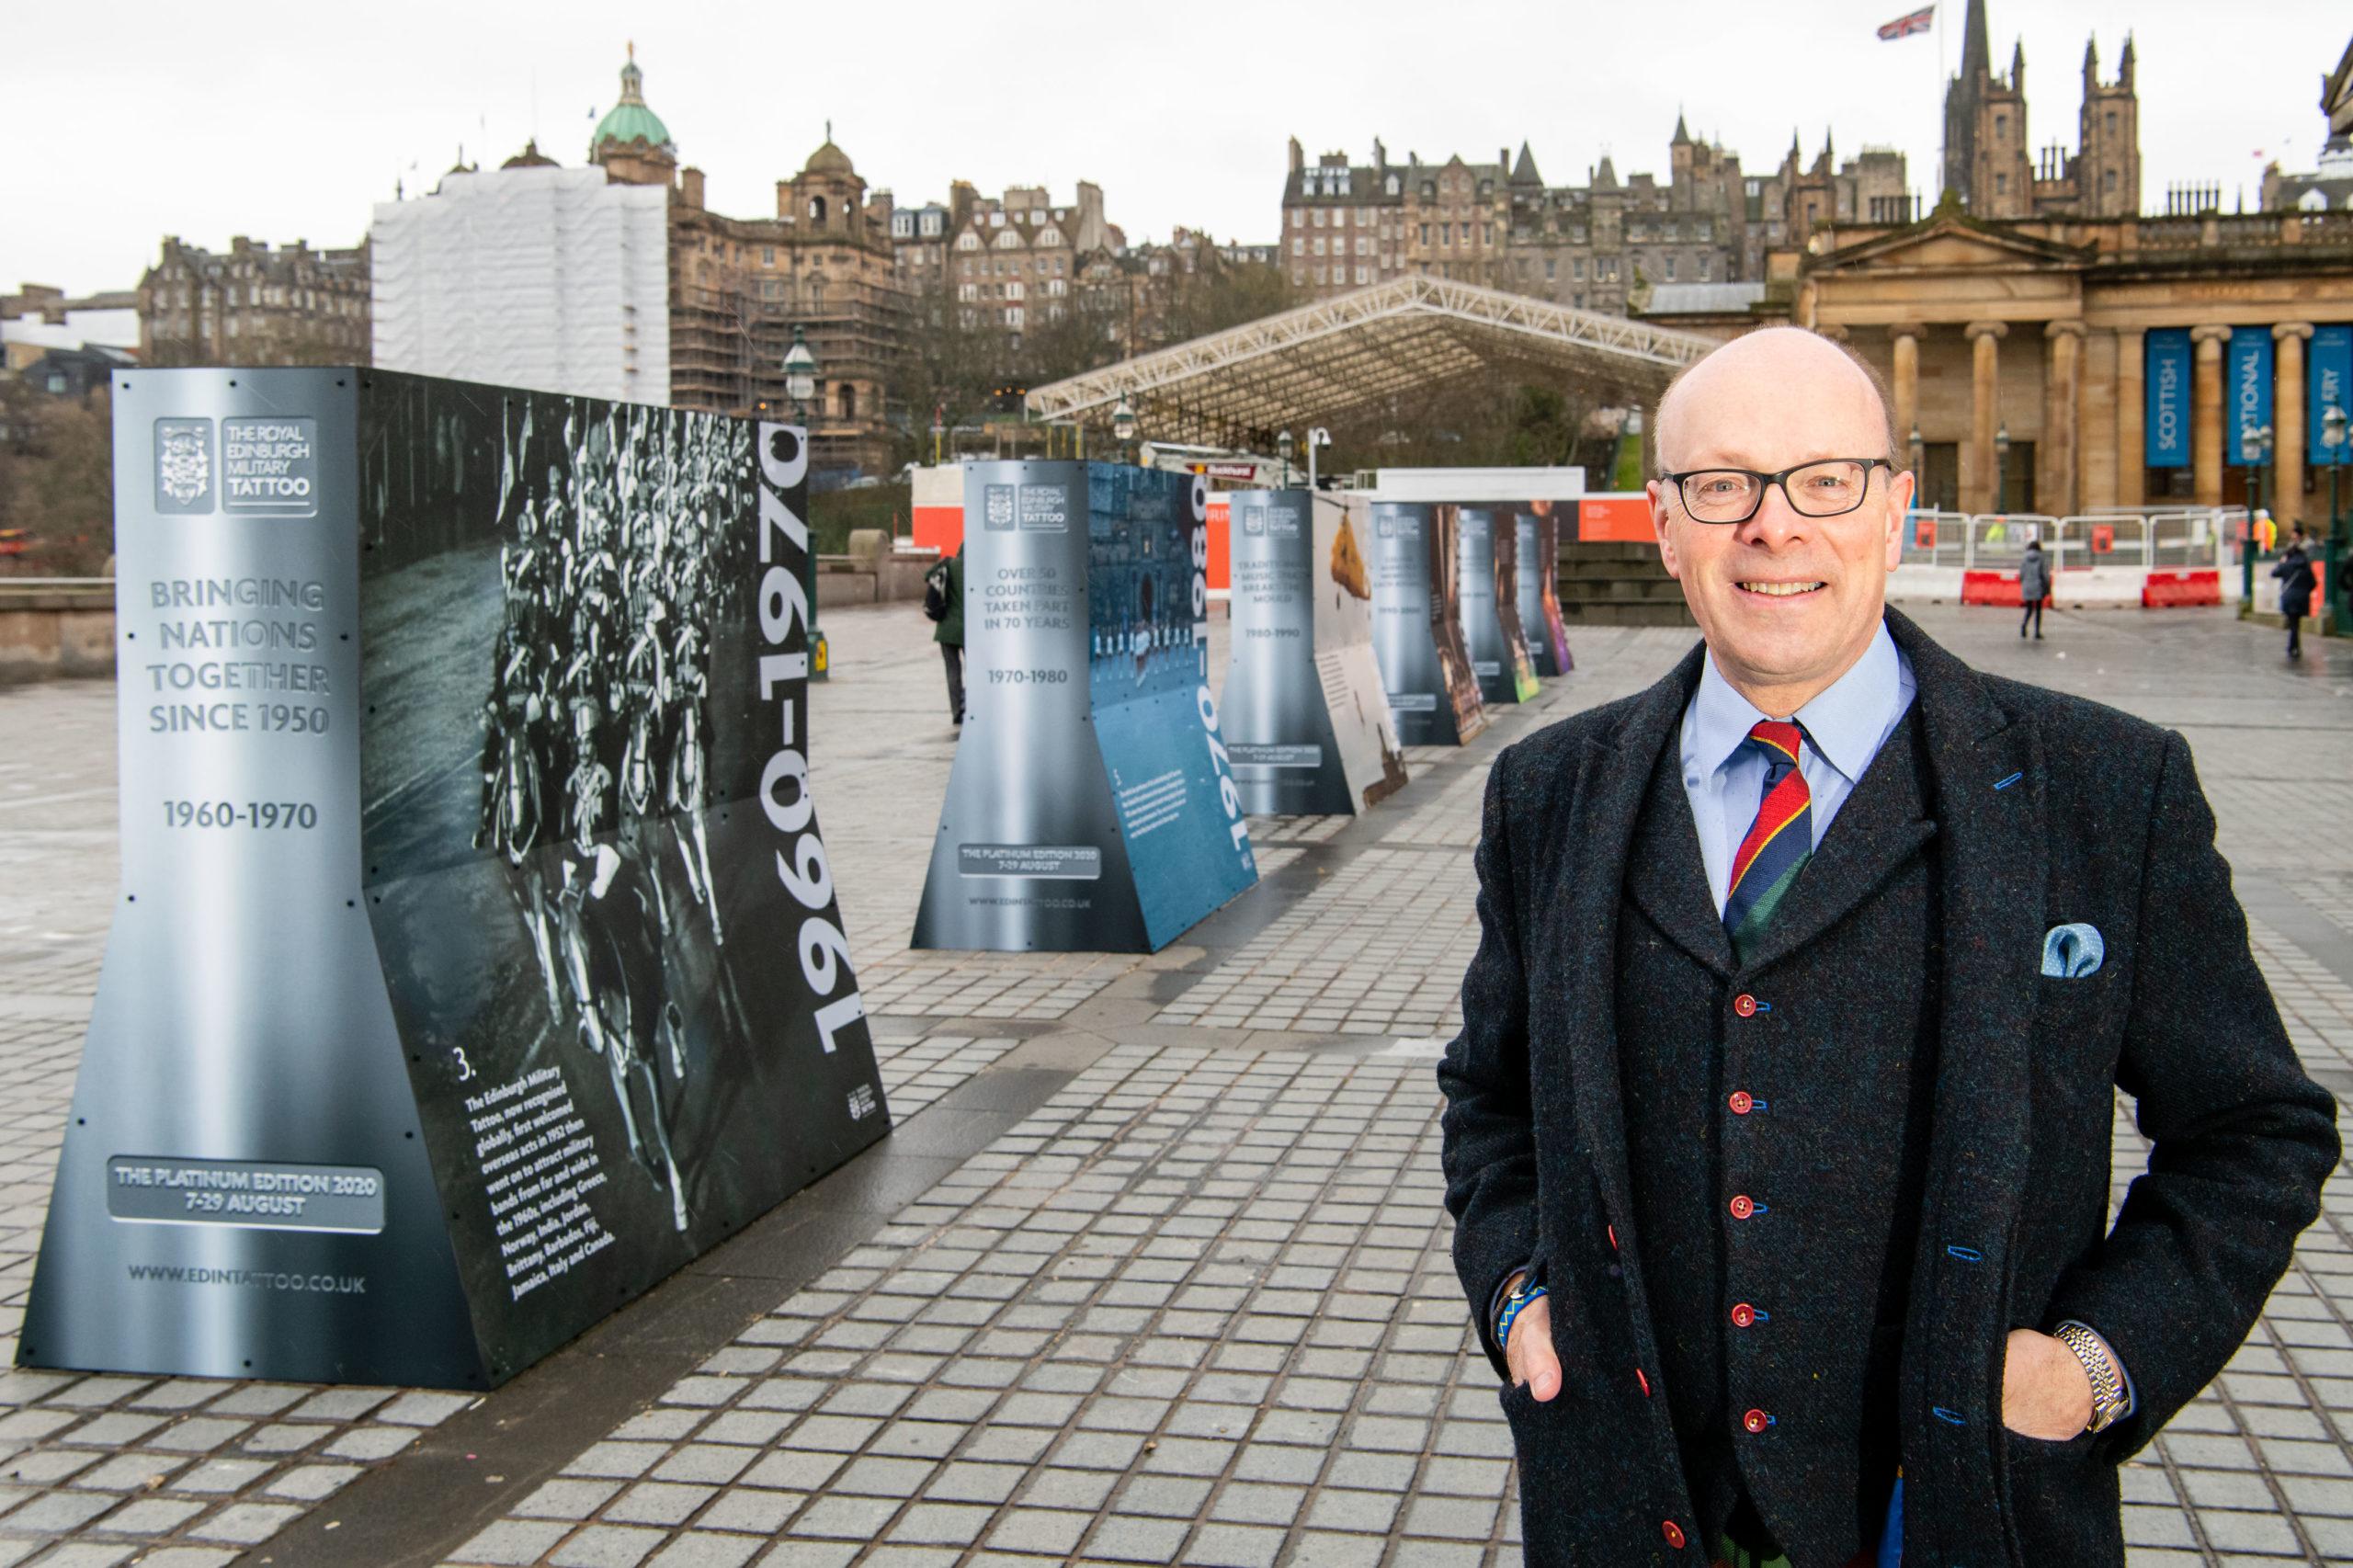 Brigadier David Allfrey MBE at the display next to the Scottish National Gallery